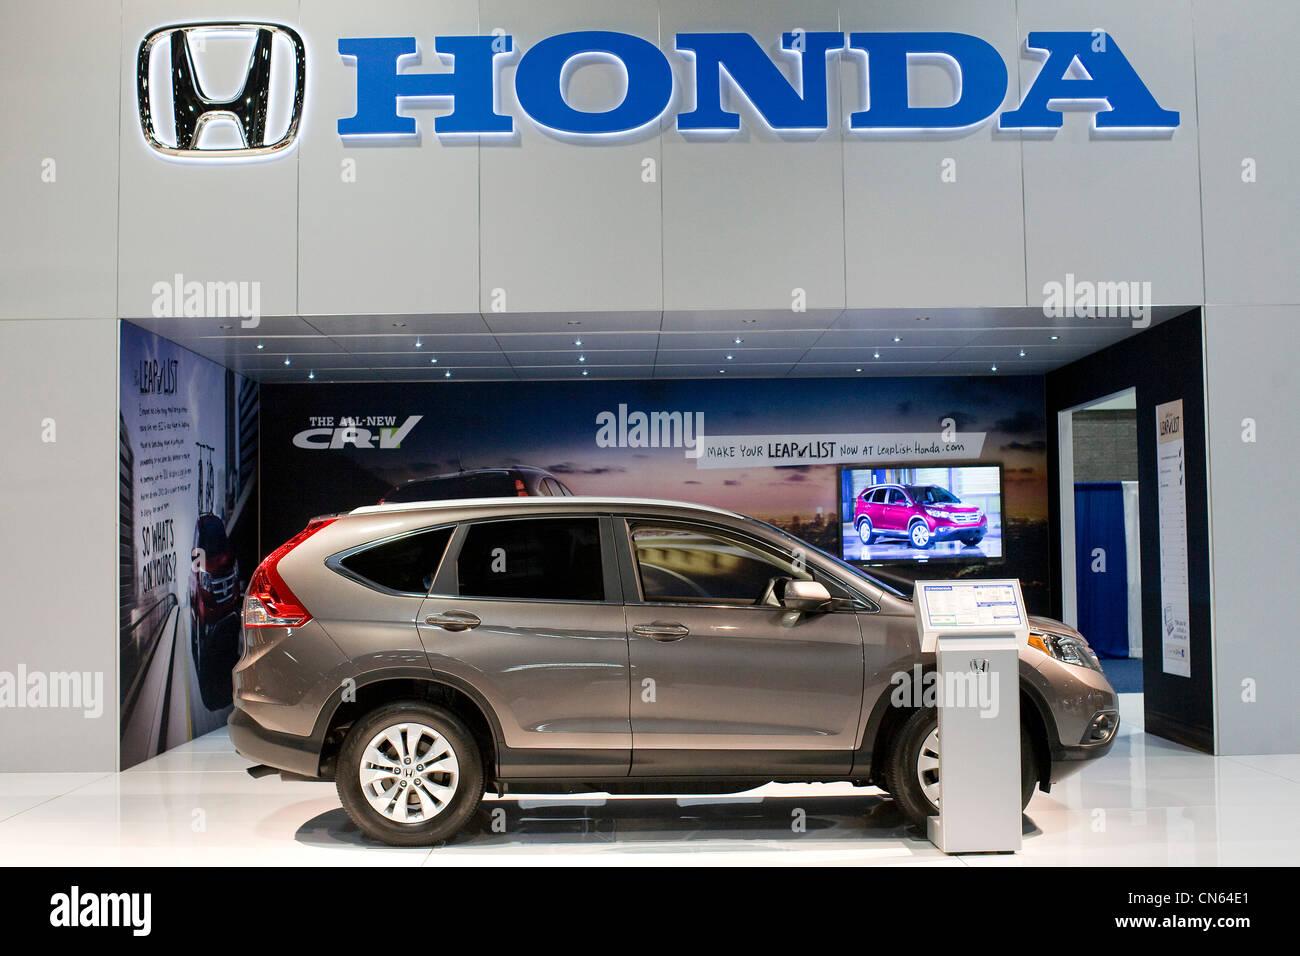 Honda CRV on display at the 2012 Washington Auto Show. - Stock Image